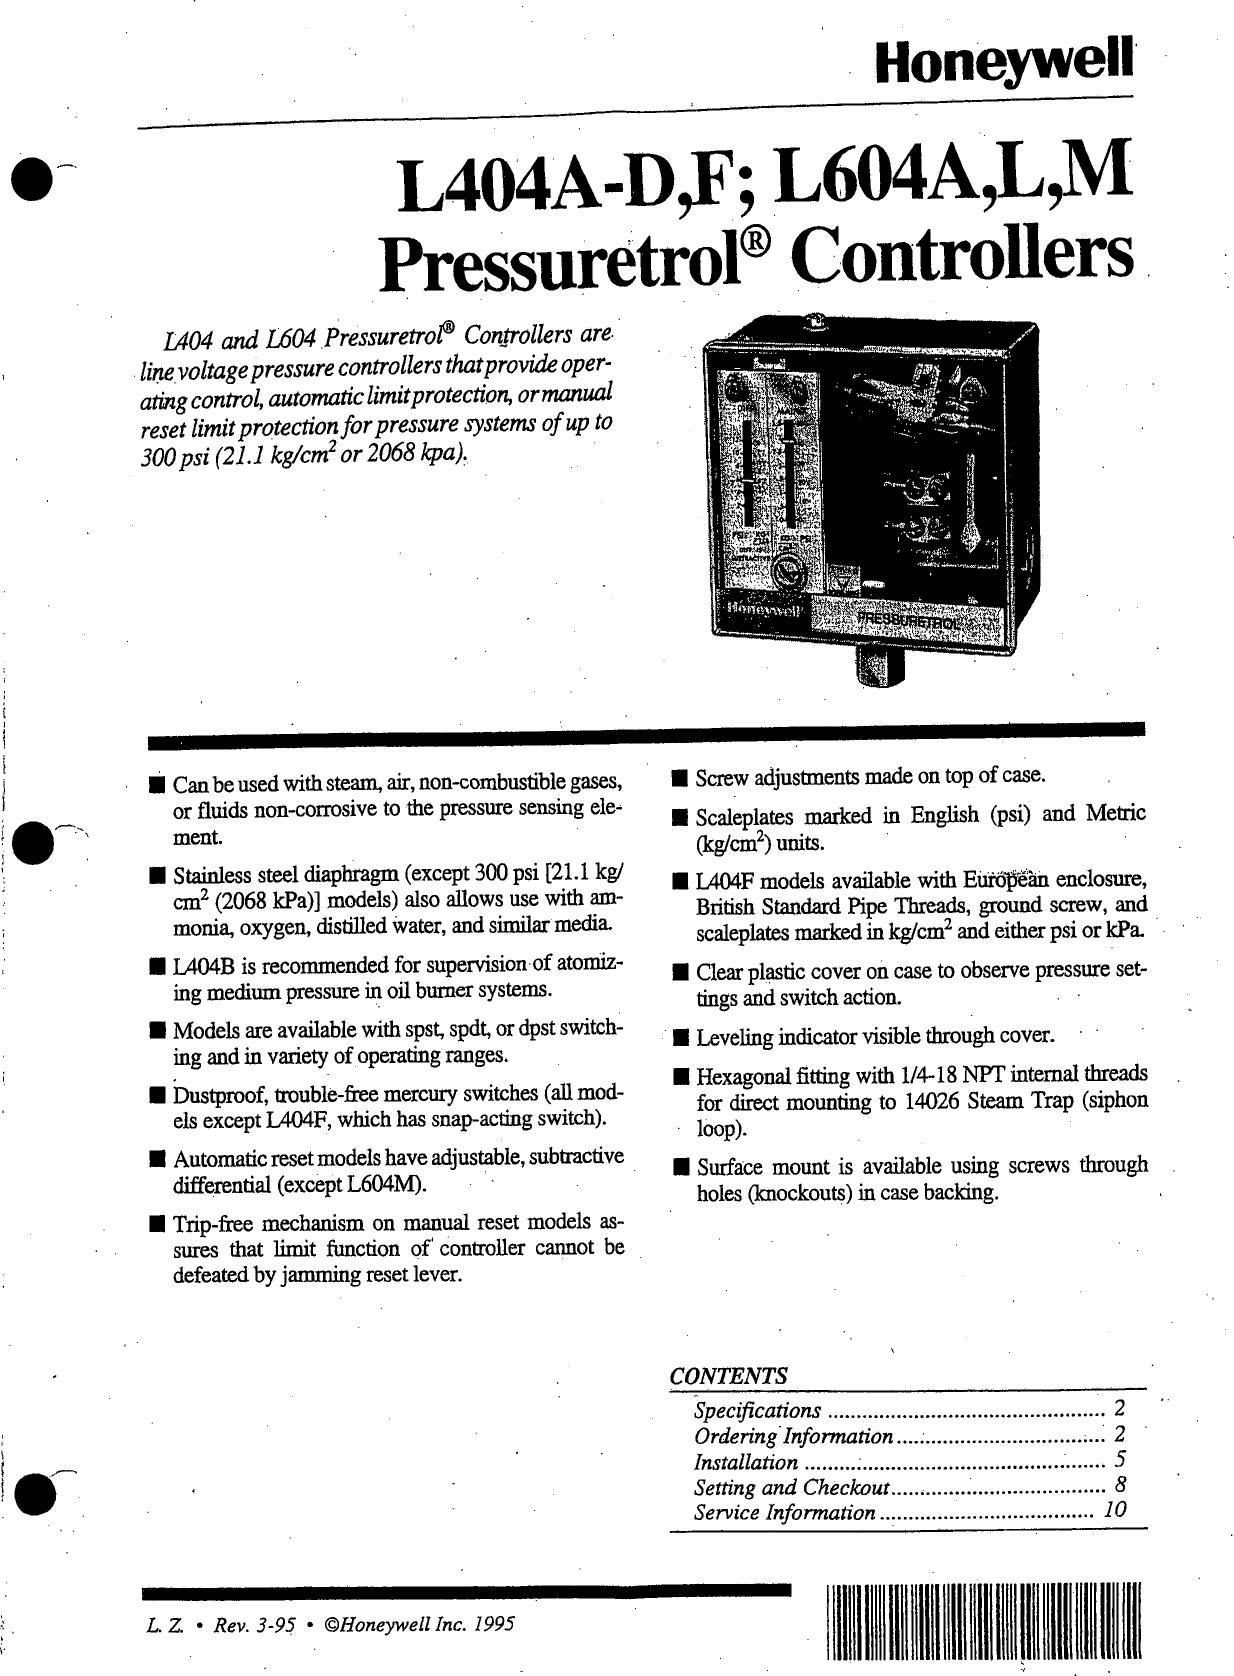 Honeywell Sleep Apnea Machine L404A D Users Manual 4b